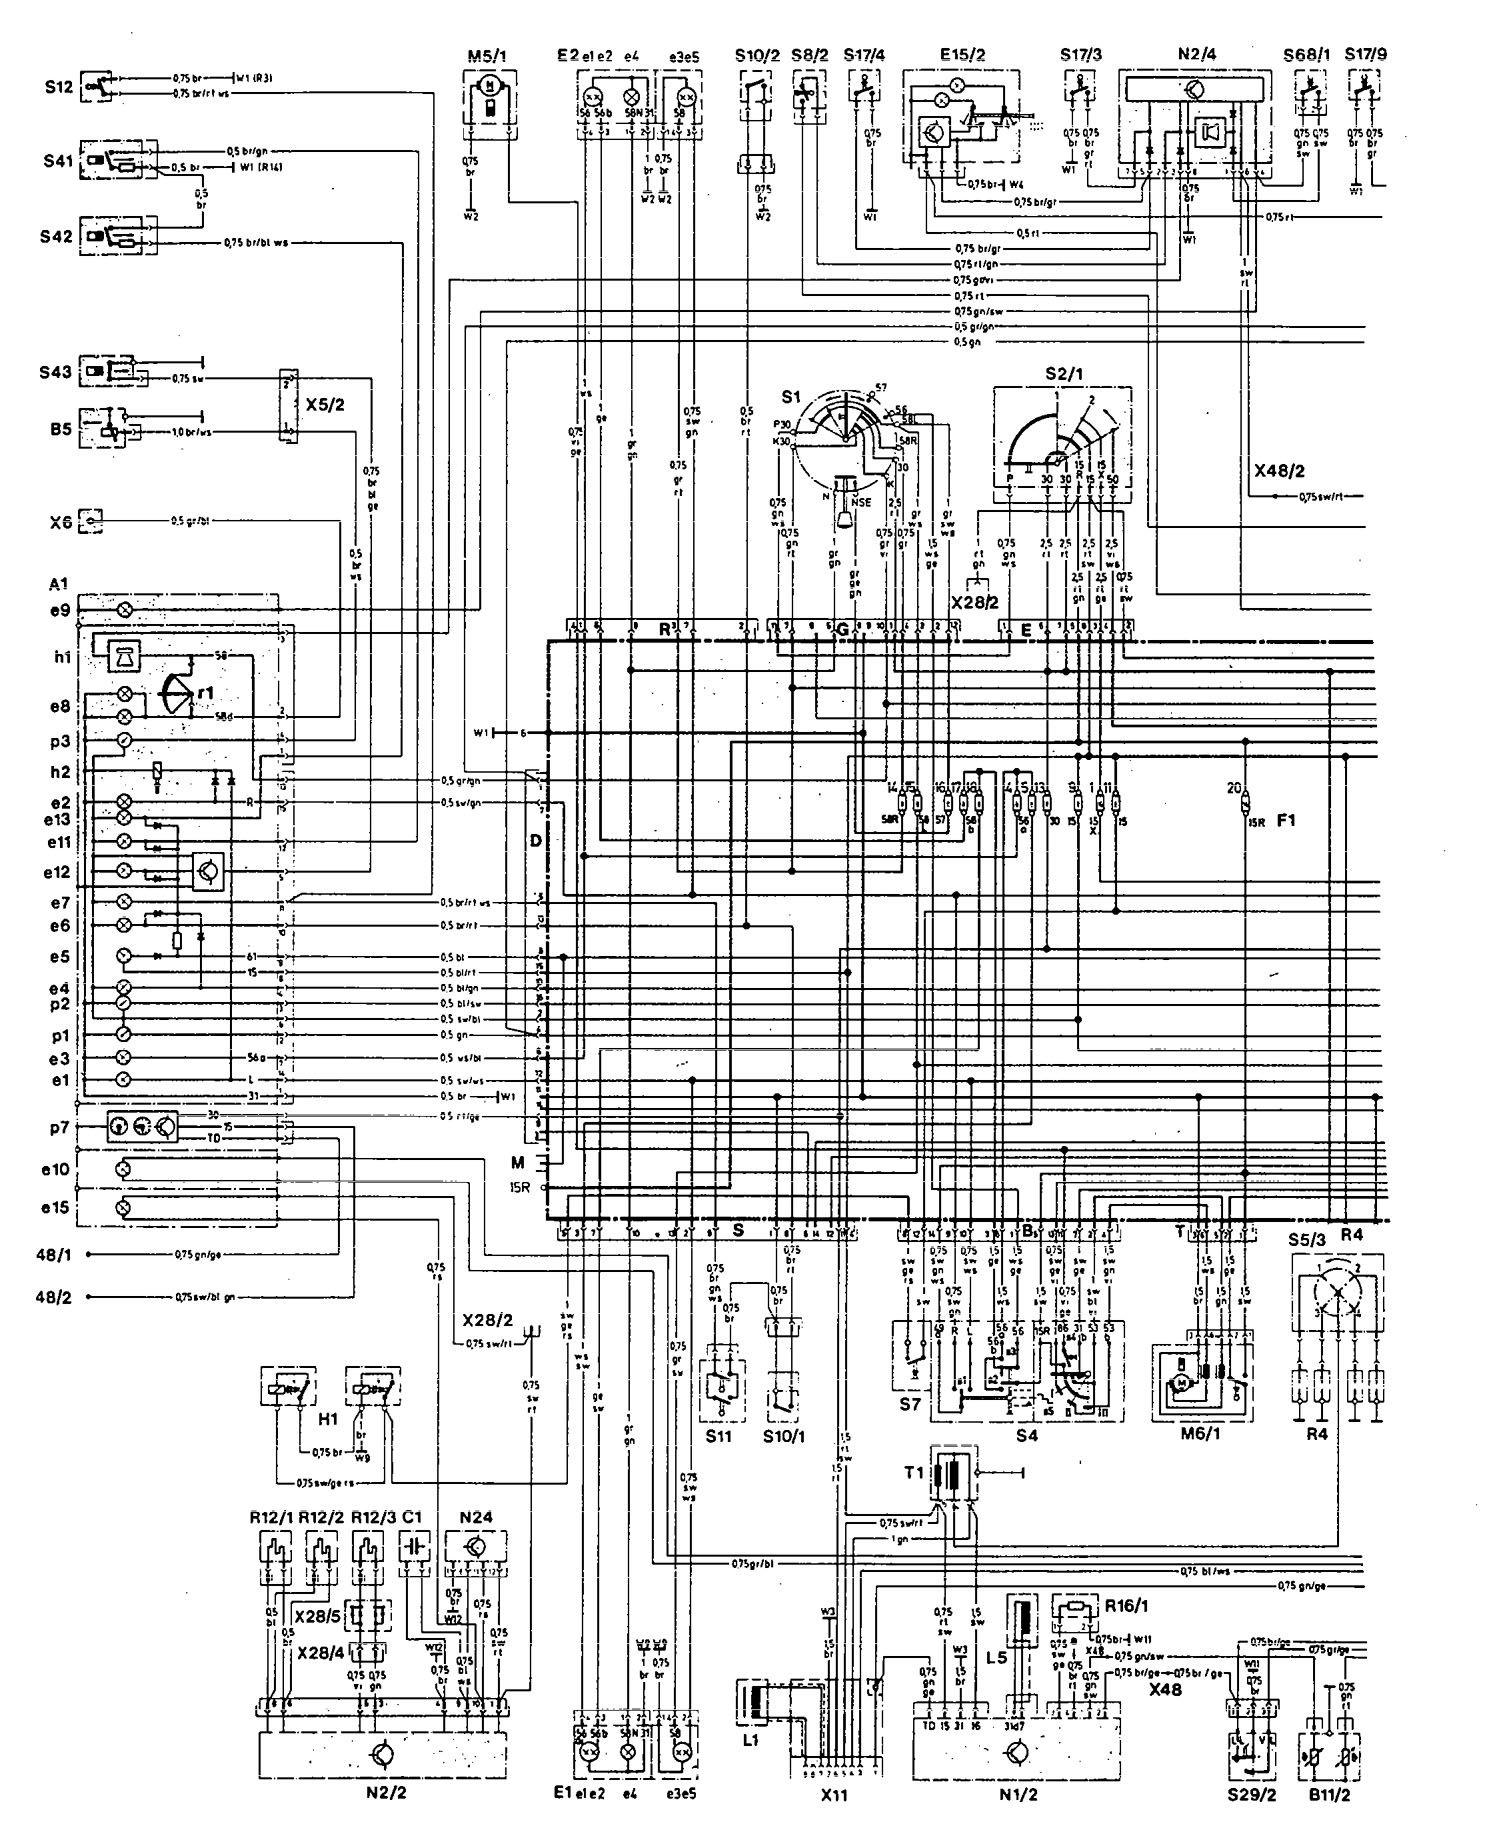 Groß 1989 Bmw 325i Schaltplan Bilder - Verdrahtungsideen - korsmi.info